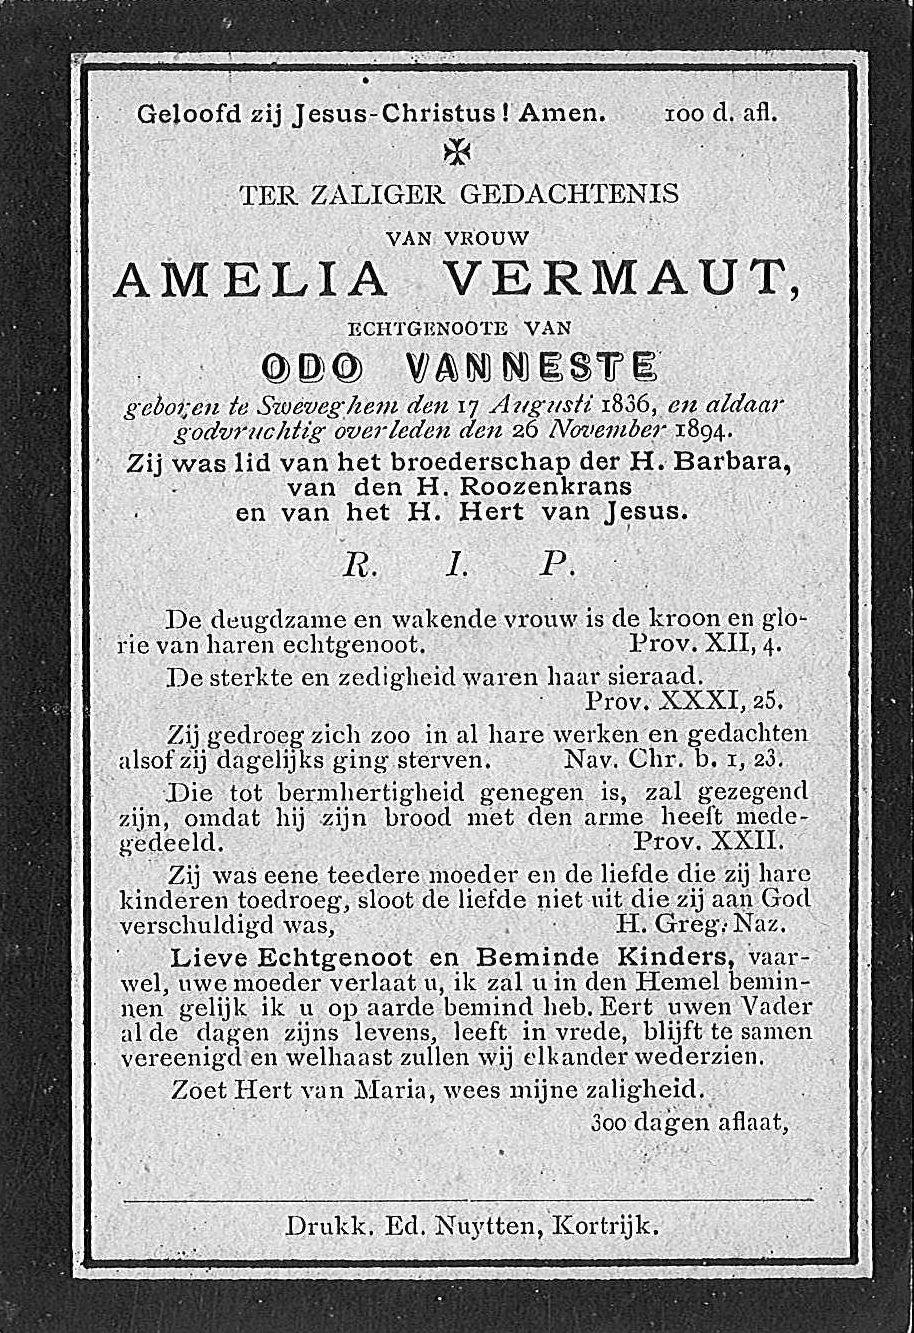 Amelia Vermaut